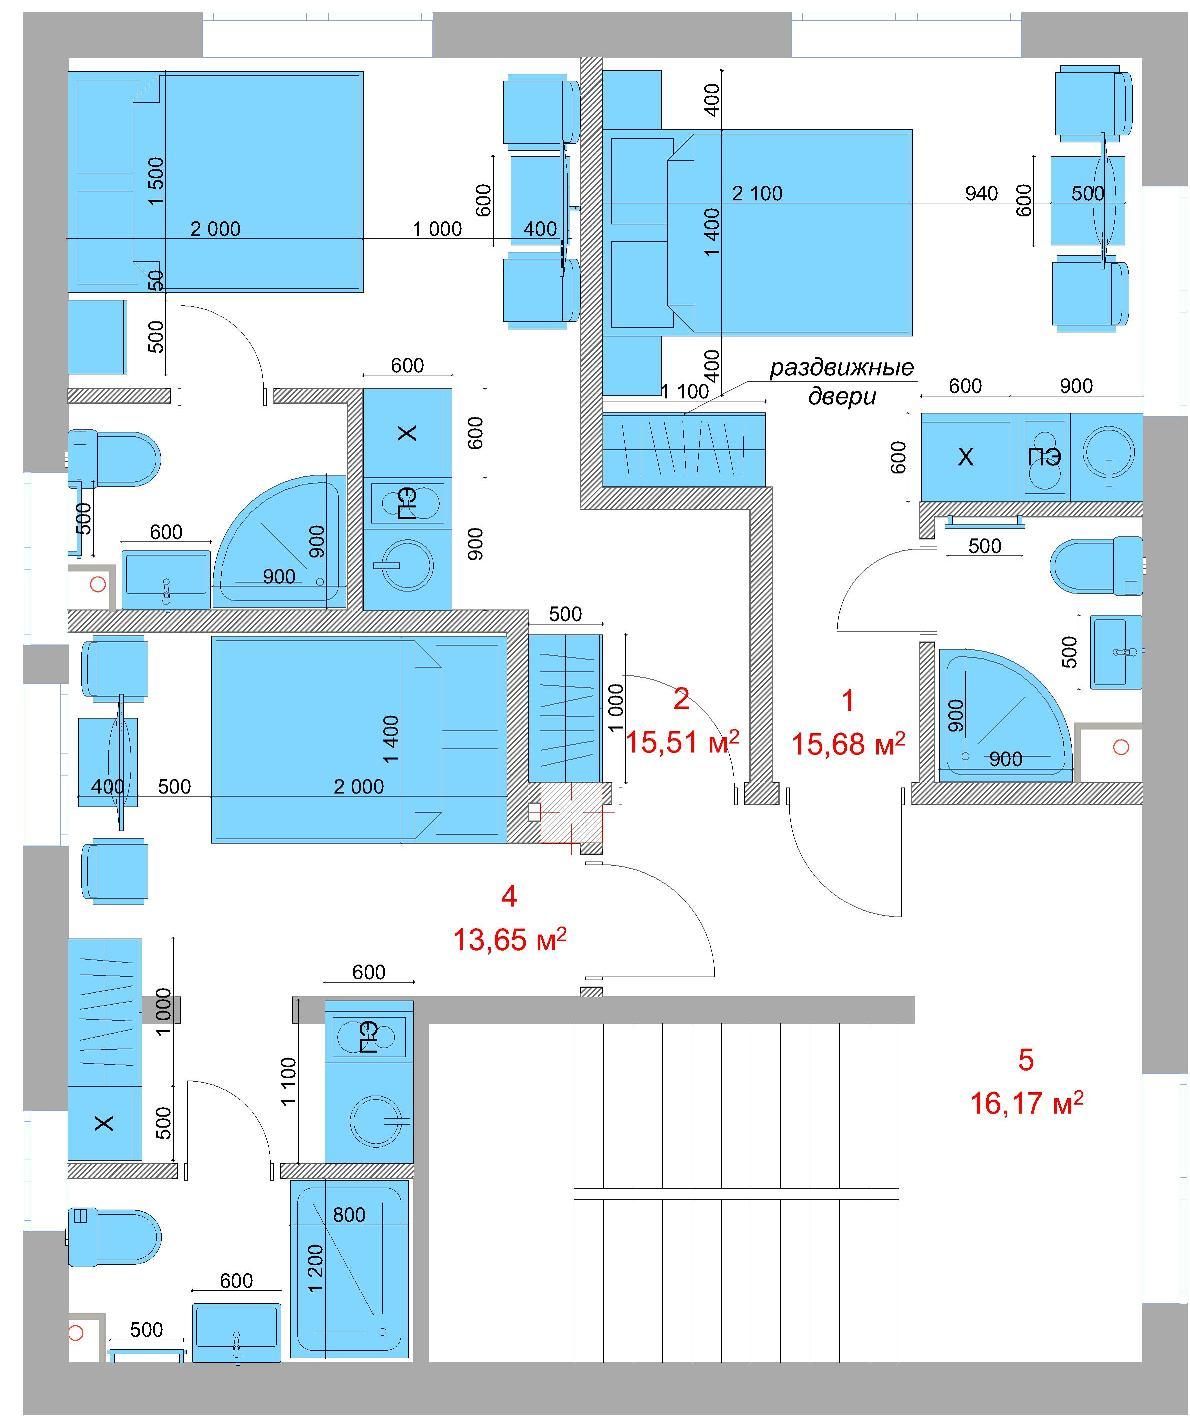 ЖК Шарден Сочи Планировка 2-го этажа